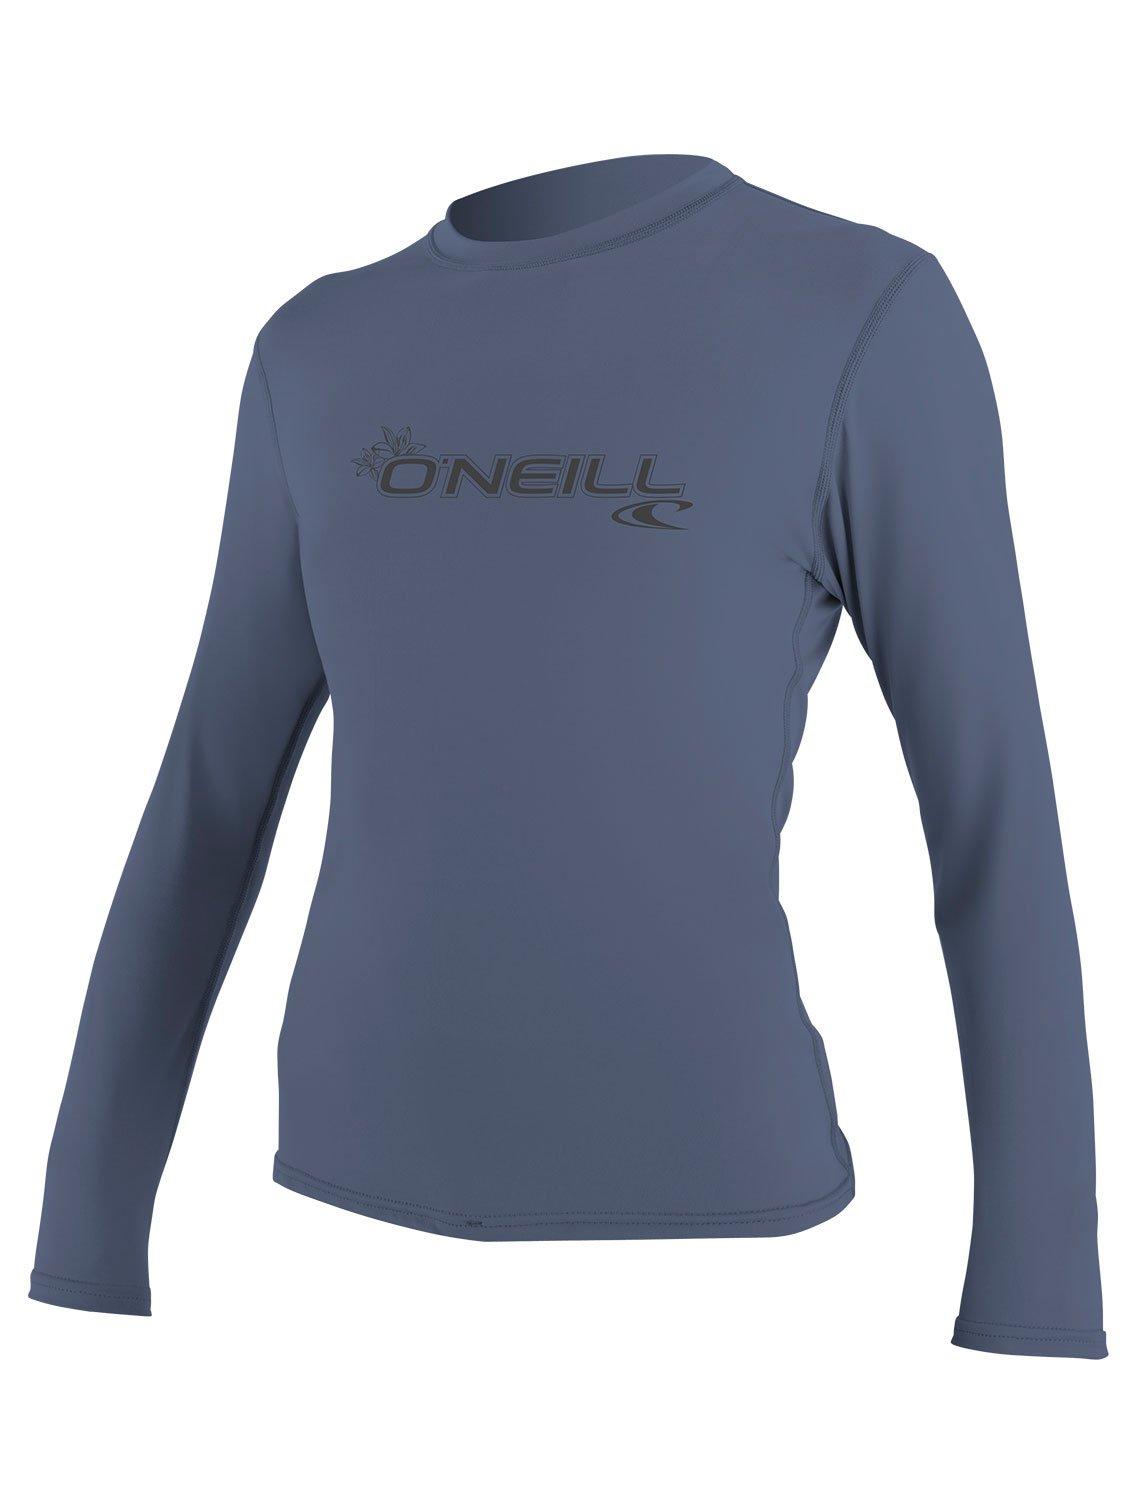 O'Neill Women's Basic Skins Upf 50+ Long Sleeve Sun Shirt, Mist, X-Large by O'Neill Wetsuits